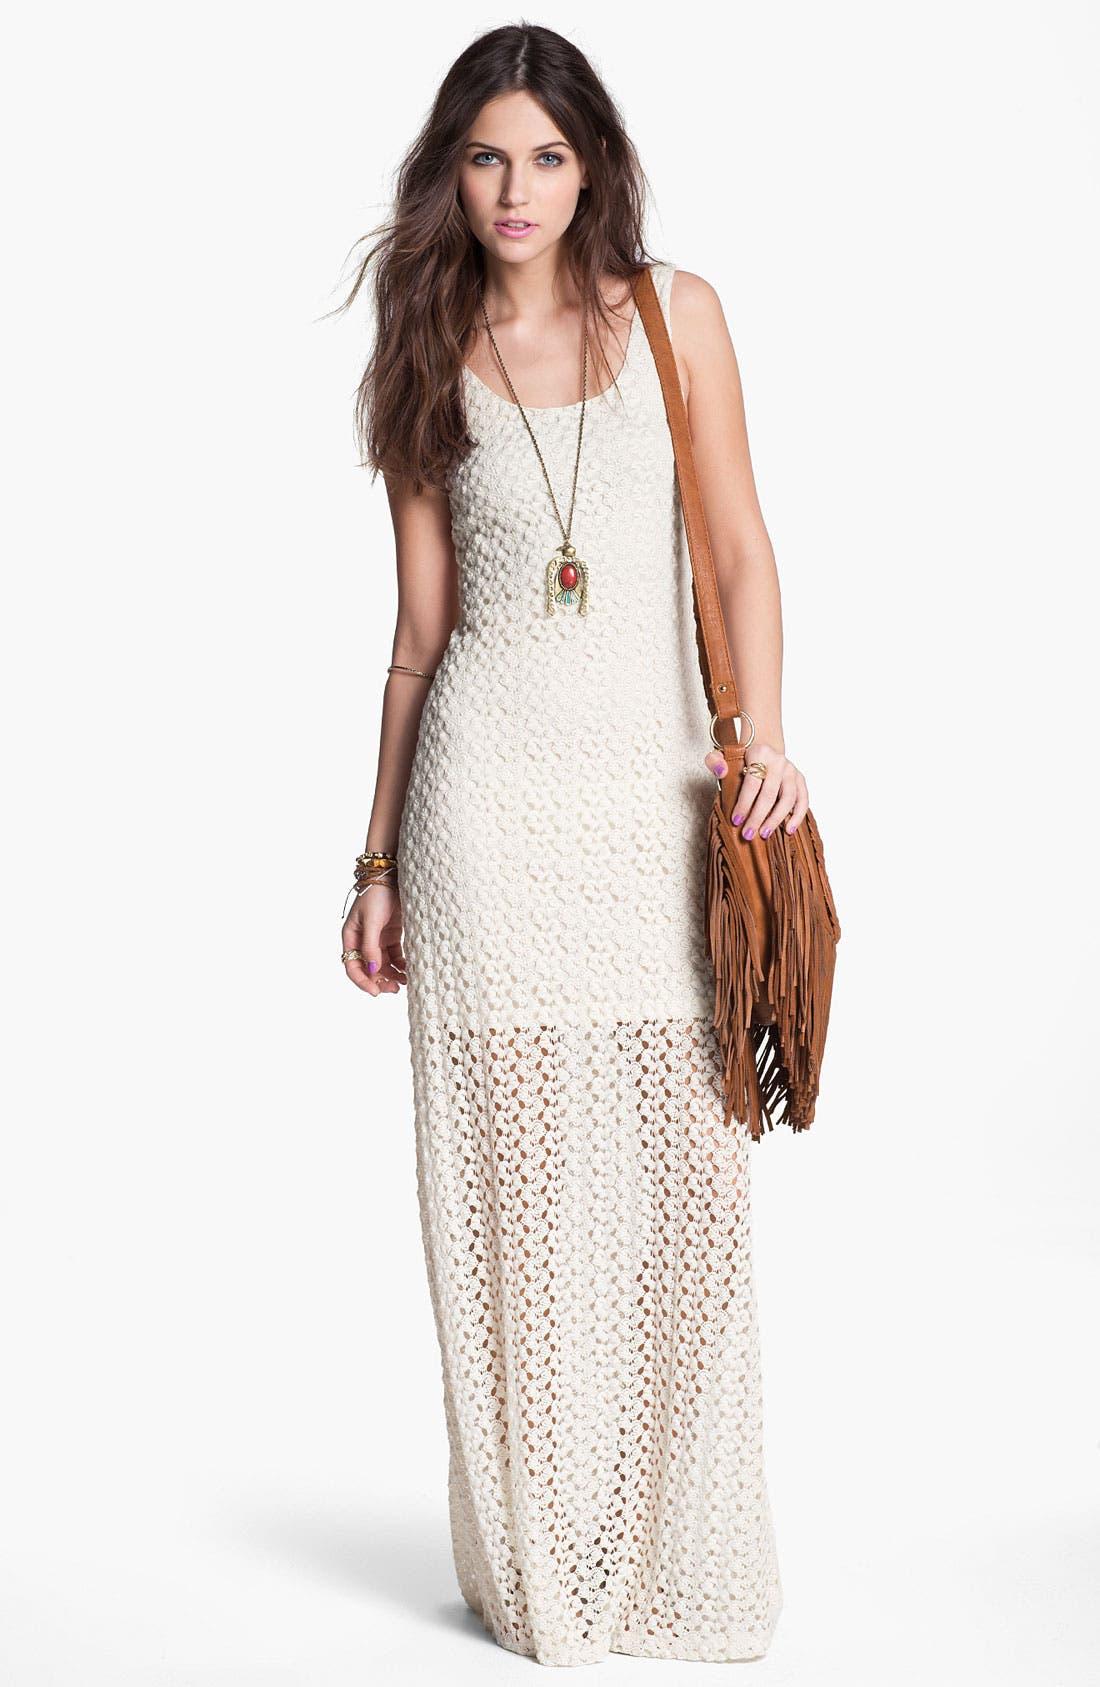 Alternate Image 1 Selected - Mimi Chica Half Sheer Crochet Maxi Dress (Juniors)